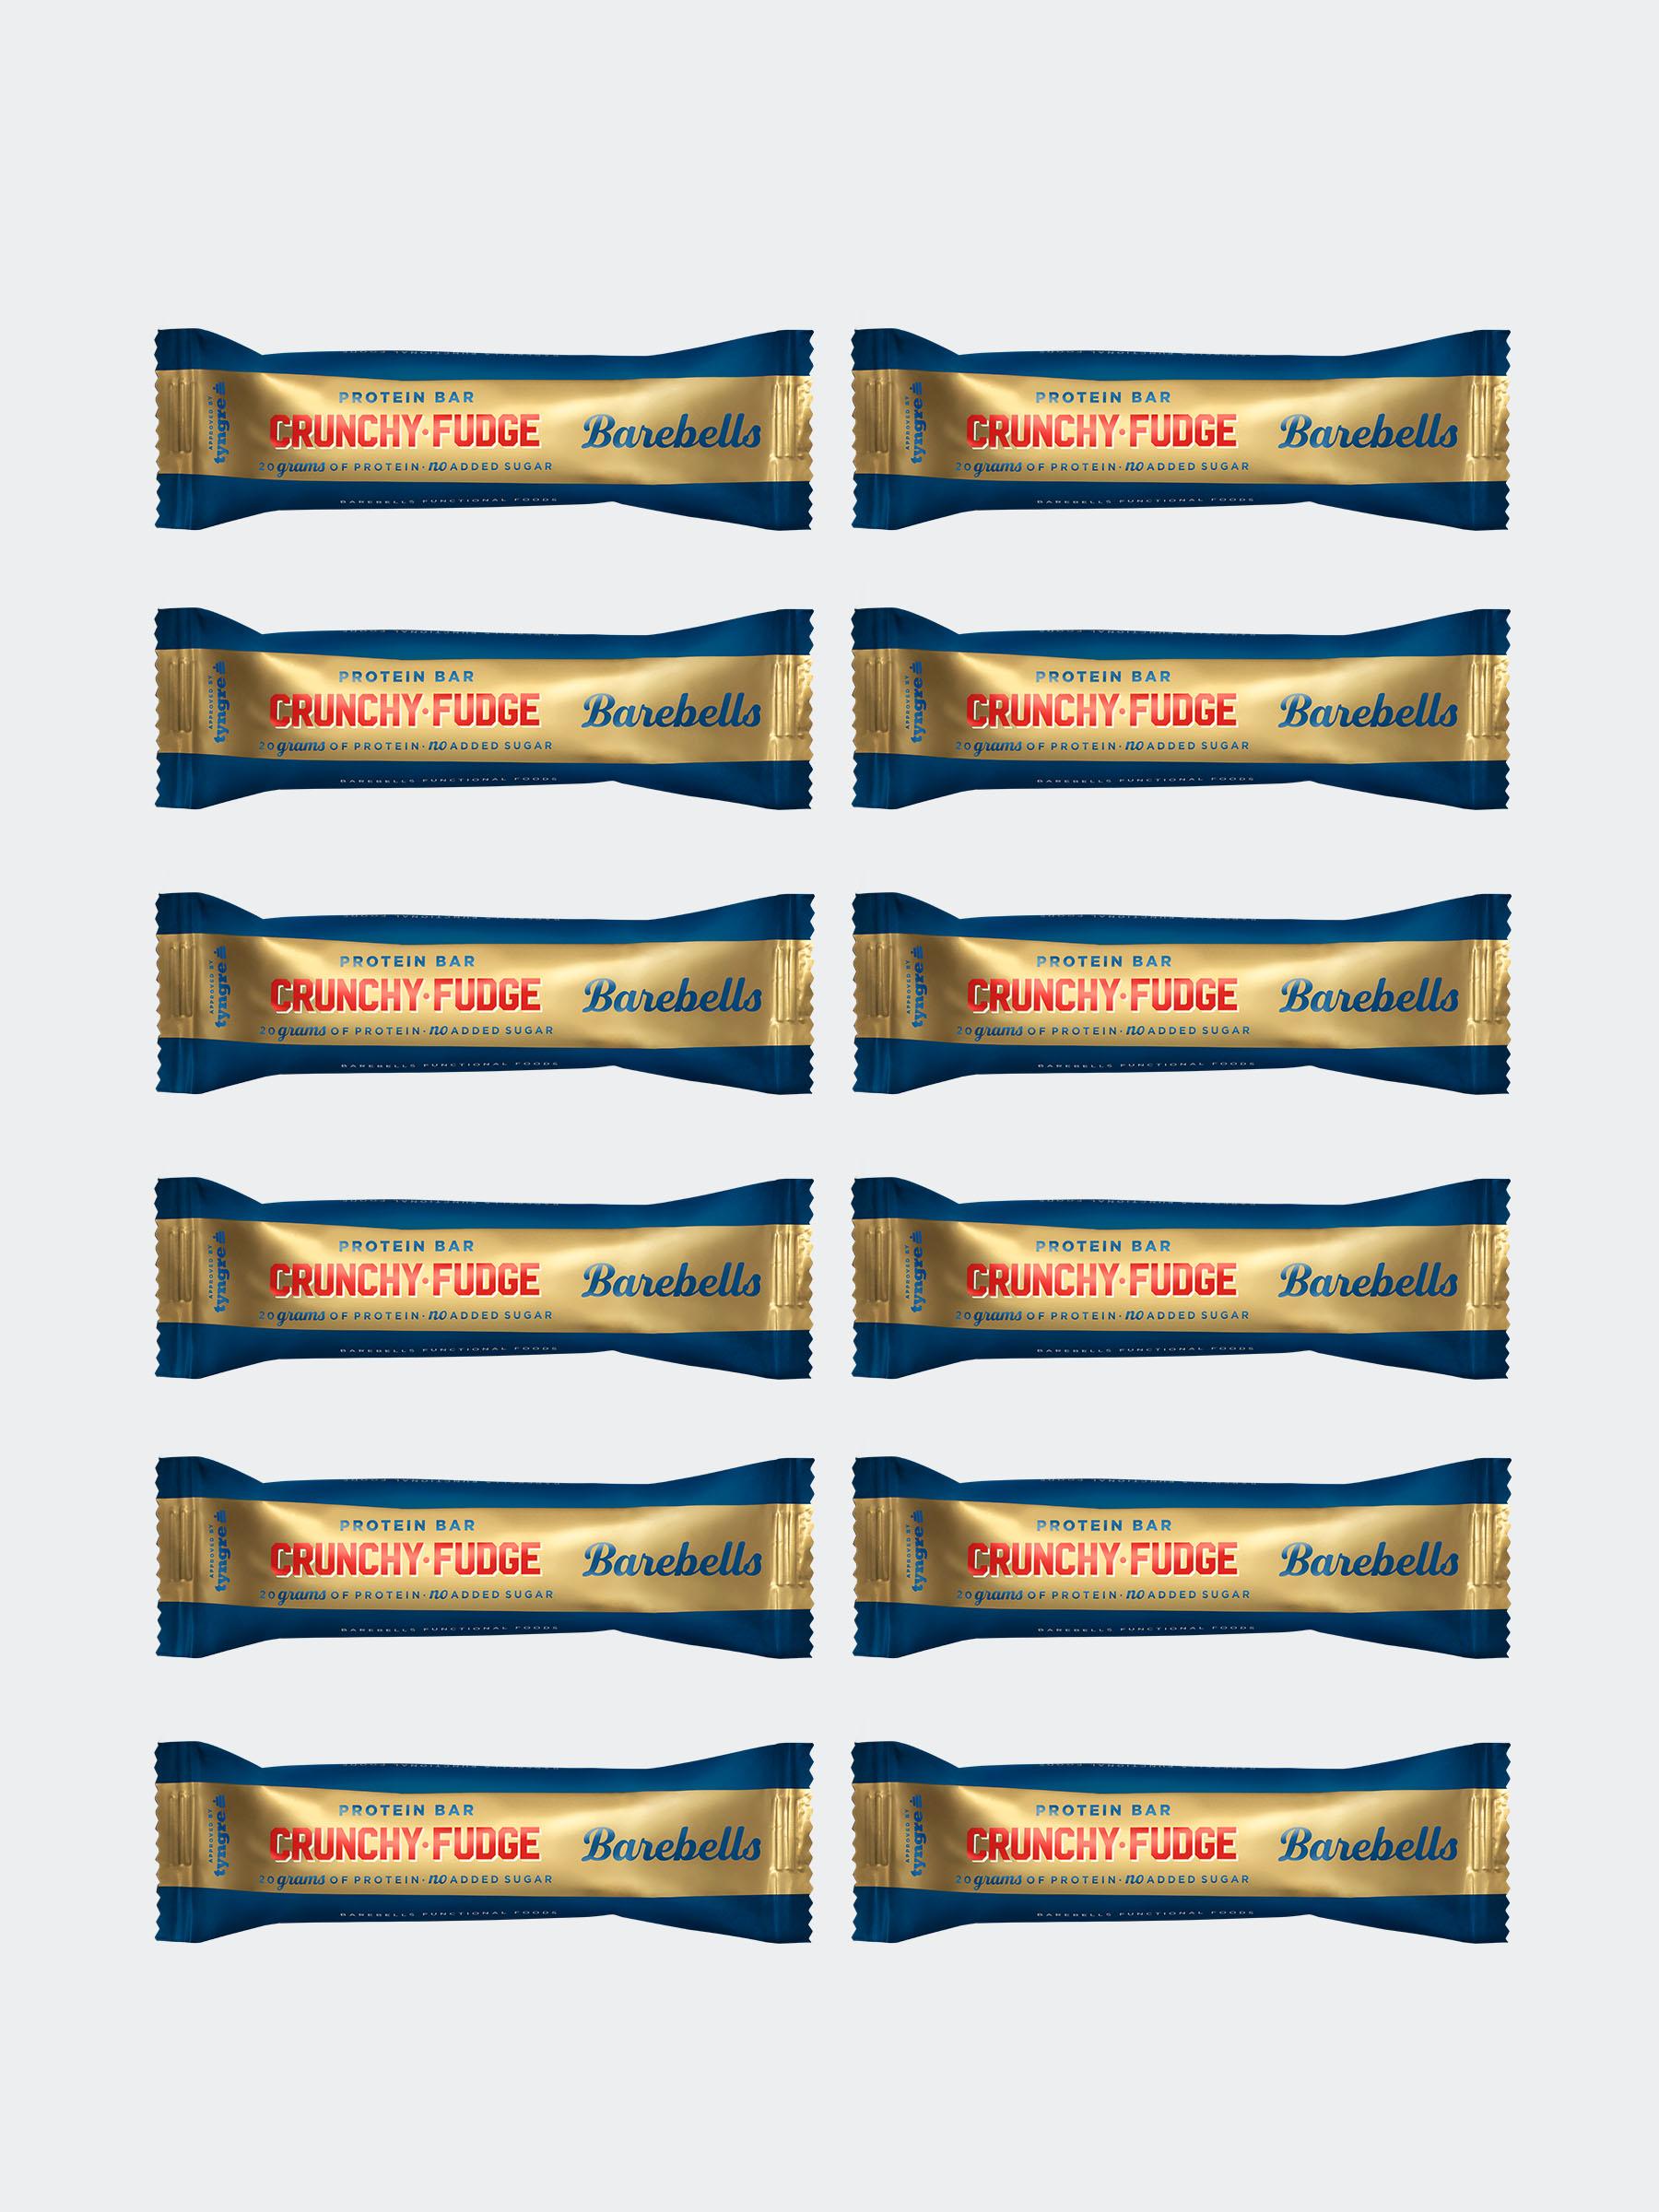 Barebells Crunchy Fudge 12-pack